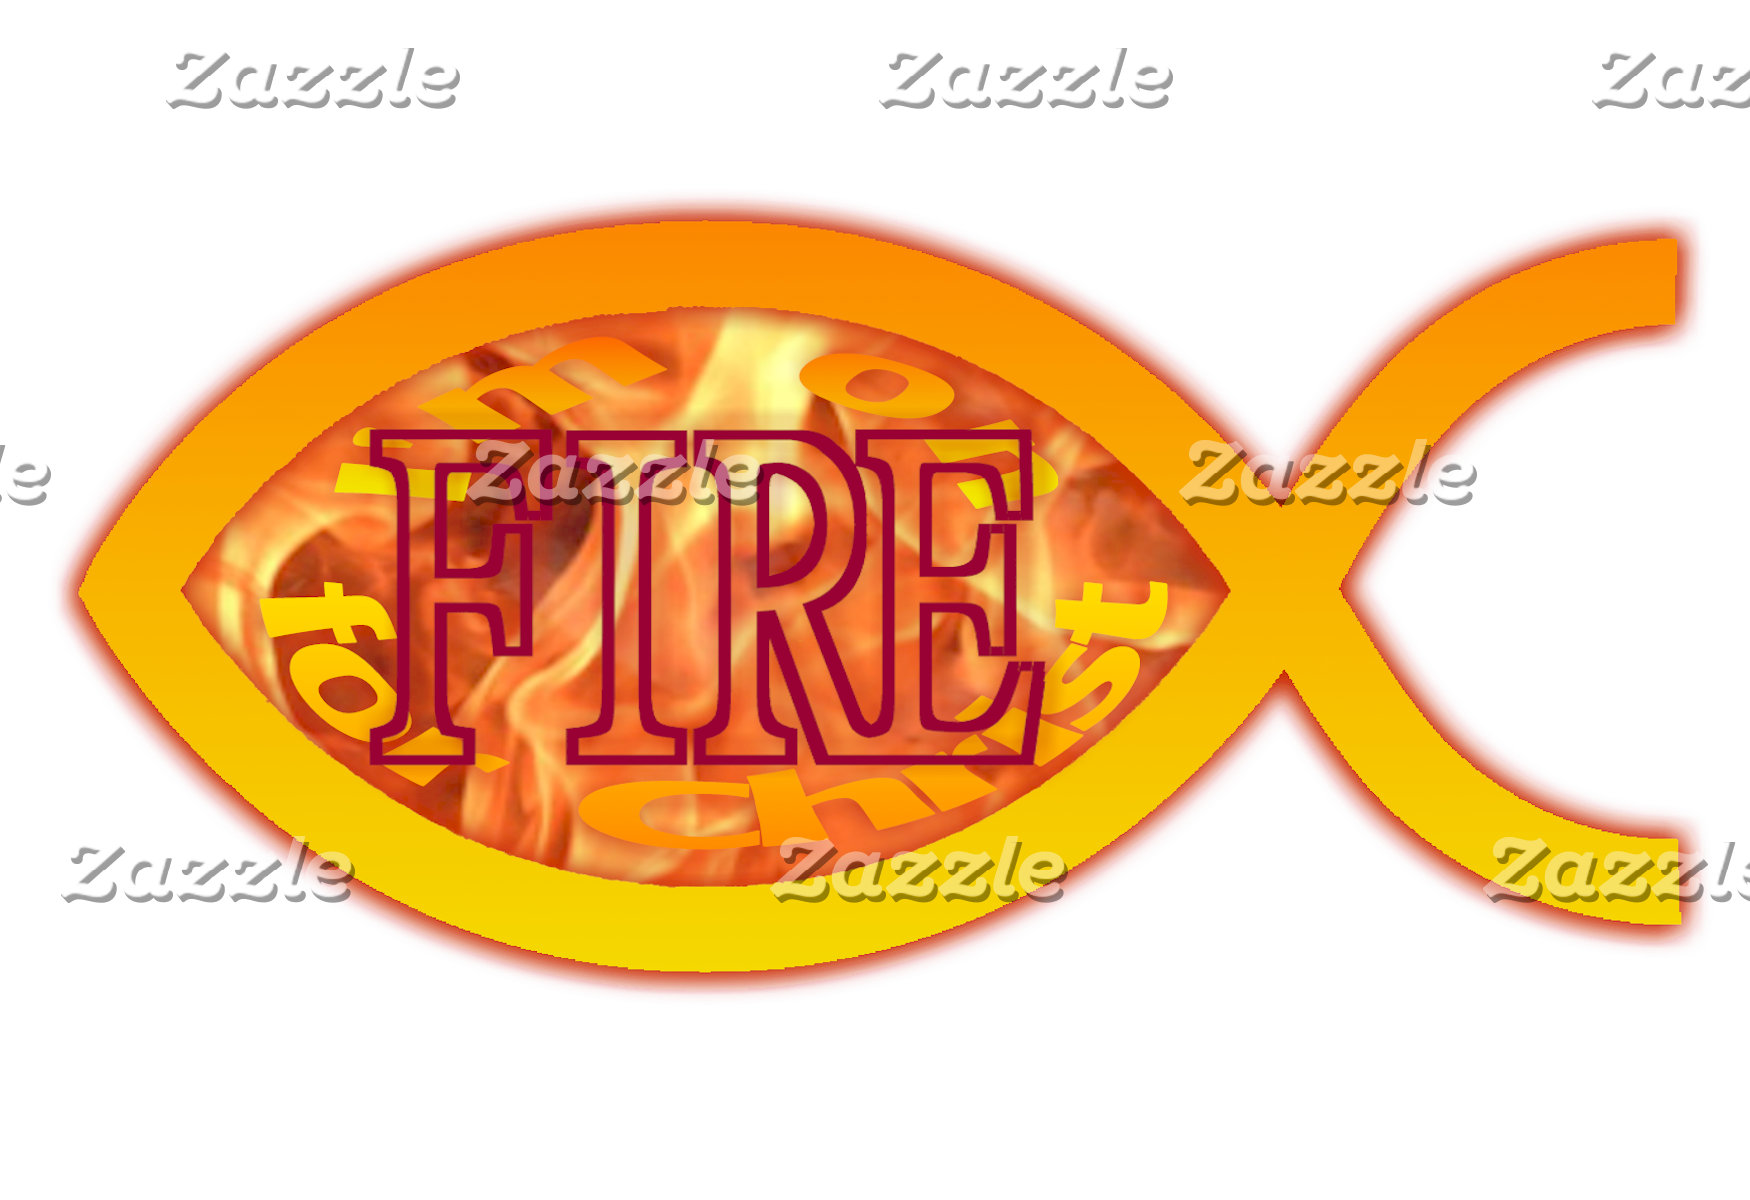 I'm on FIRE for Christ - Christian Fish Symbol